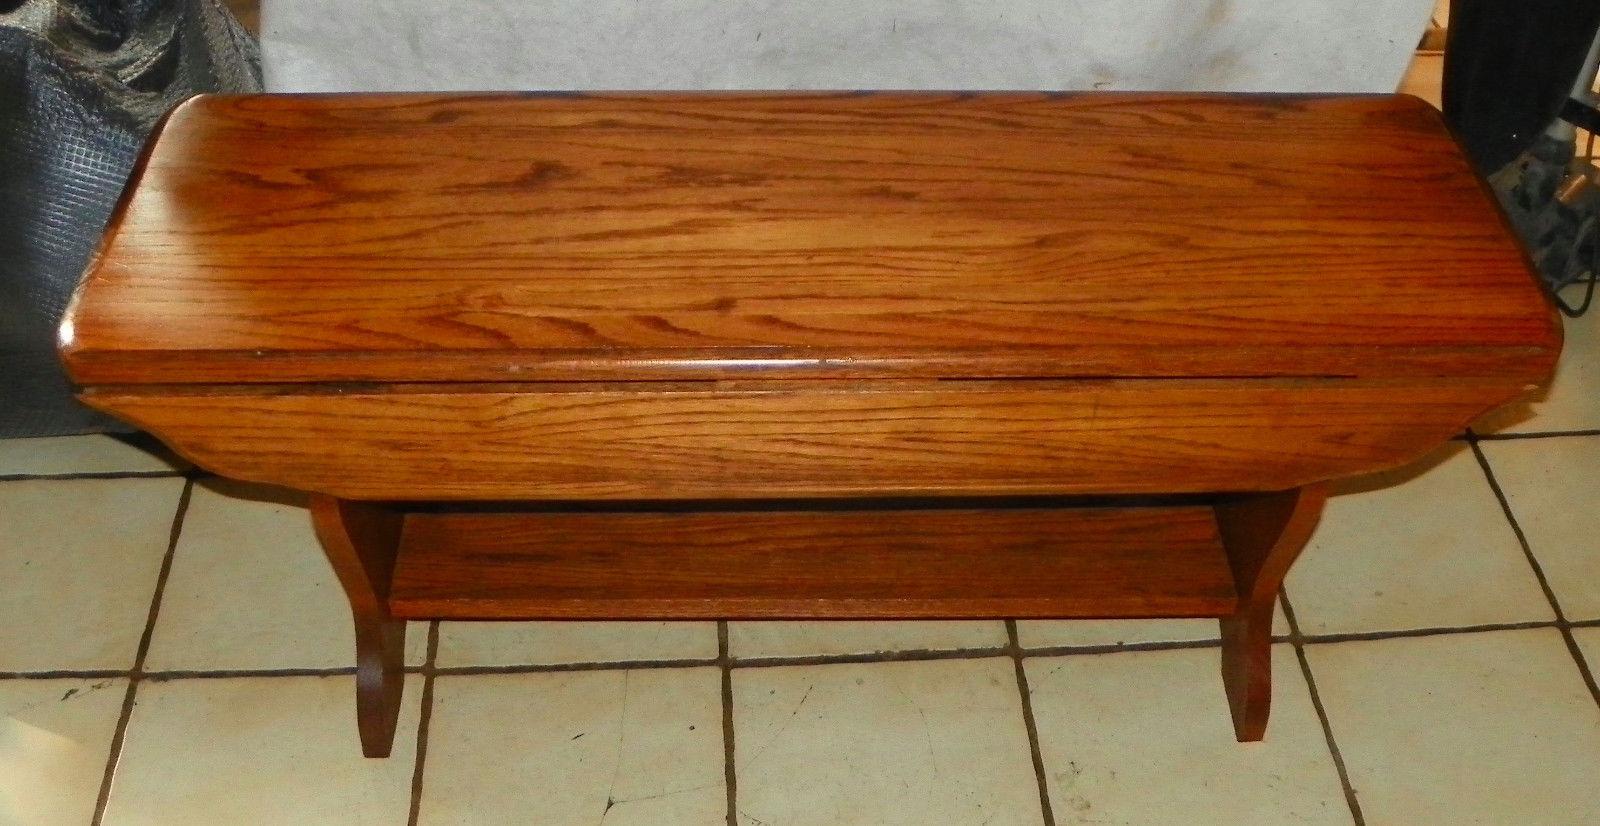 Oak Dropleaf Coffee Table - $399.00